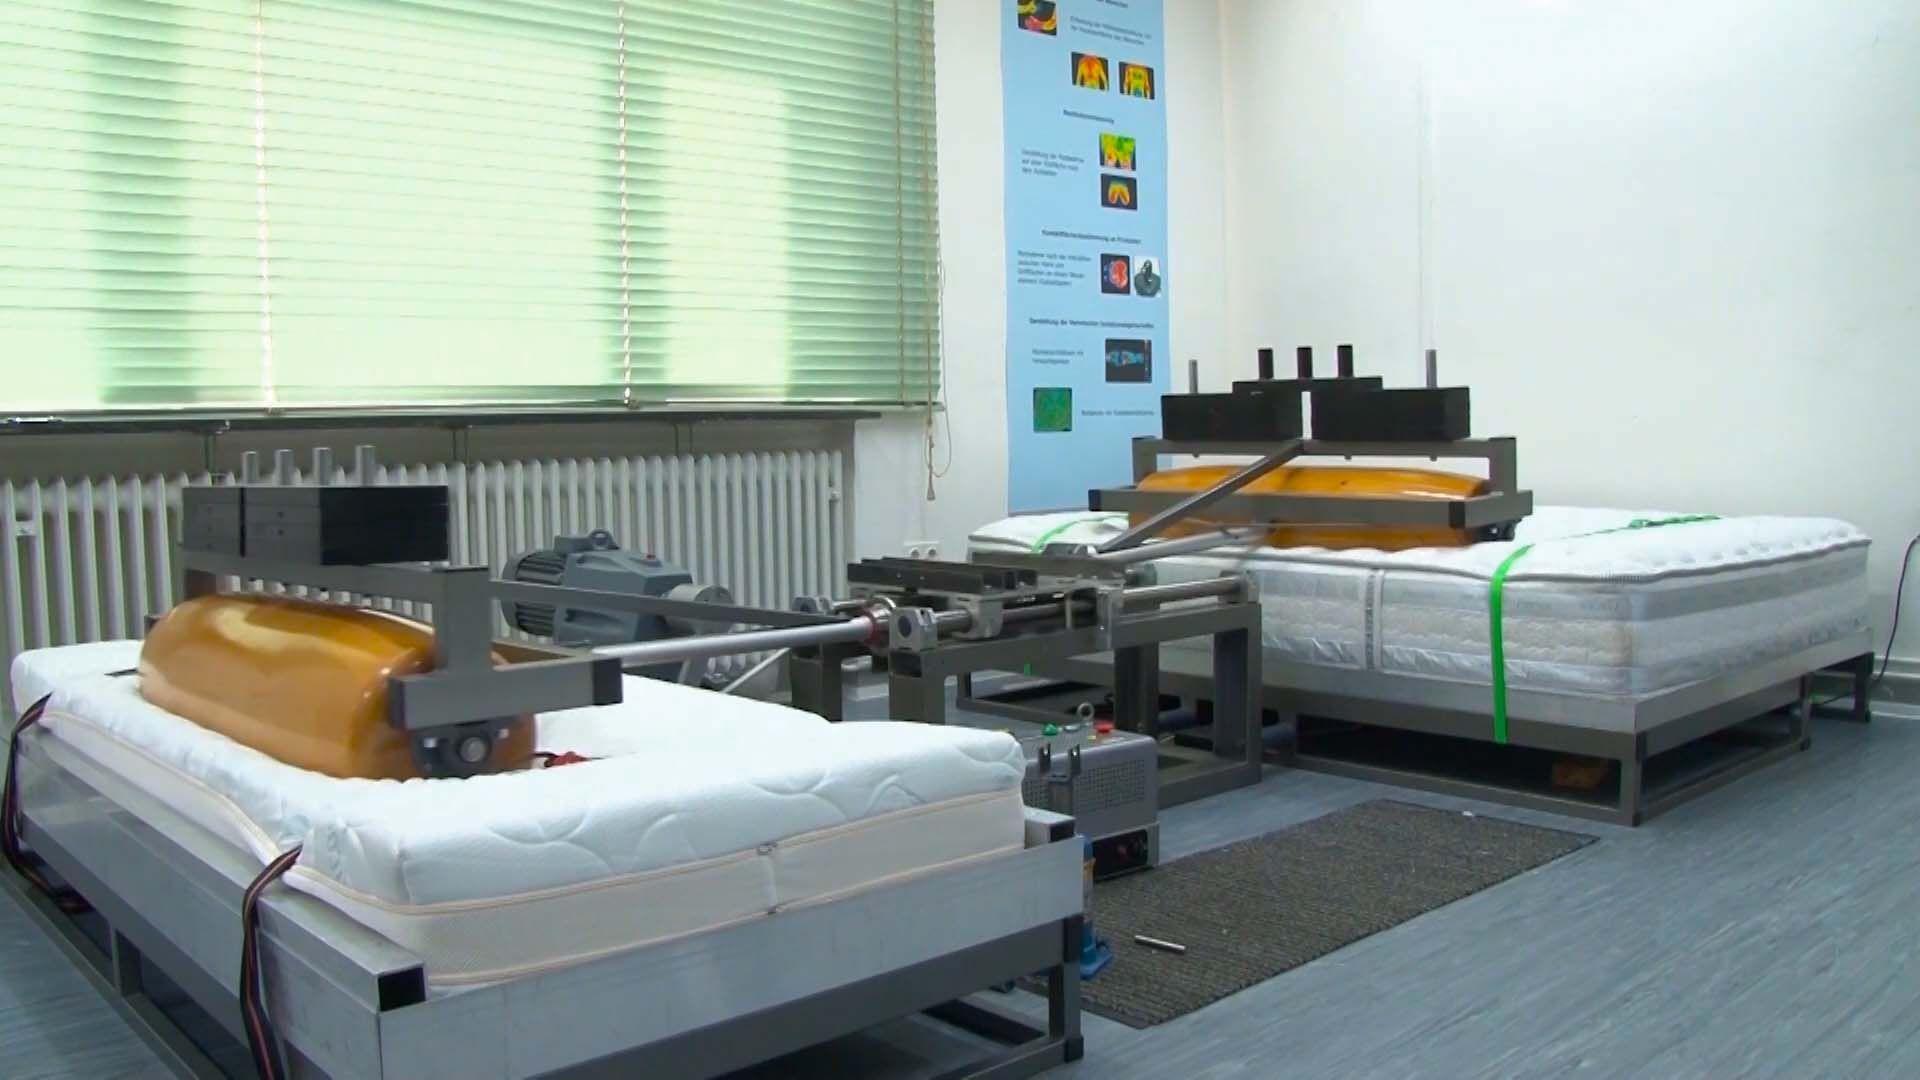 Best Value The Sleep Number c2 Bed Best mattress